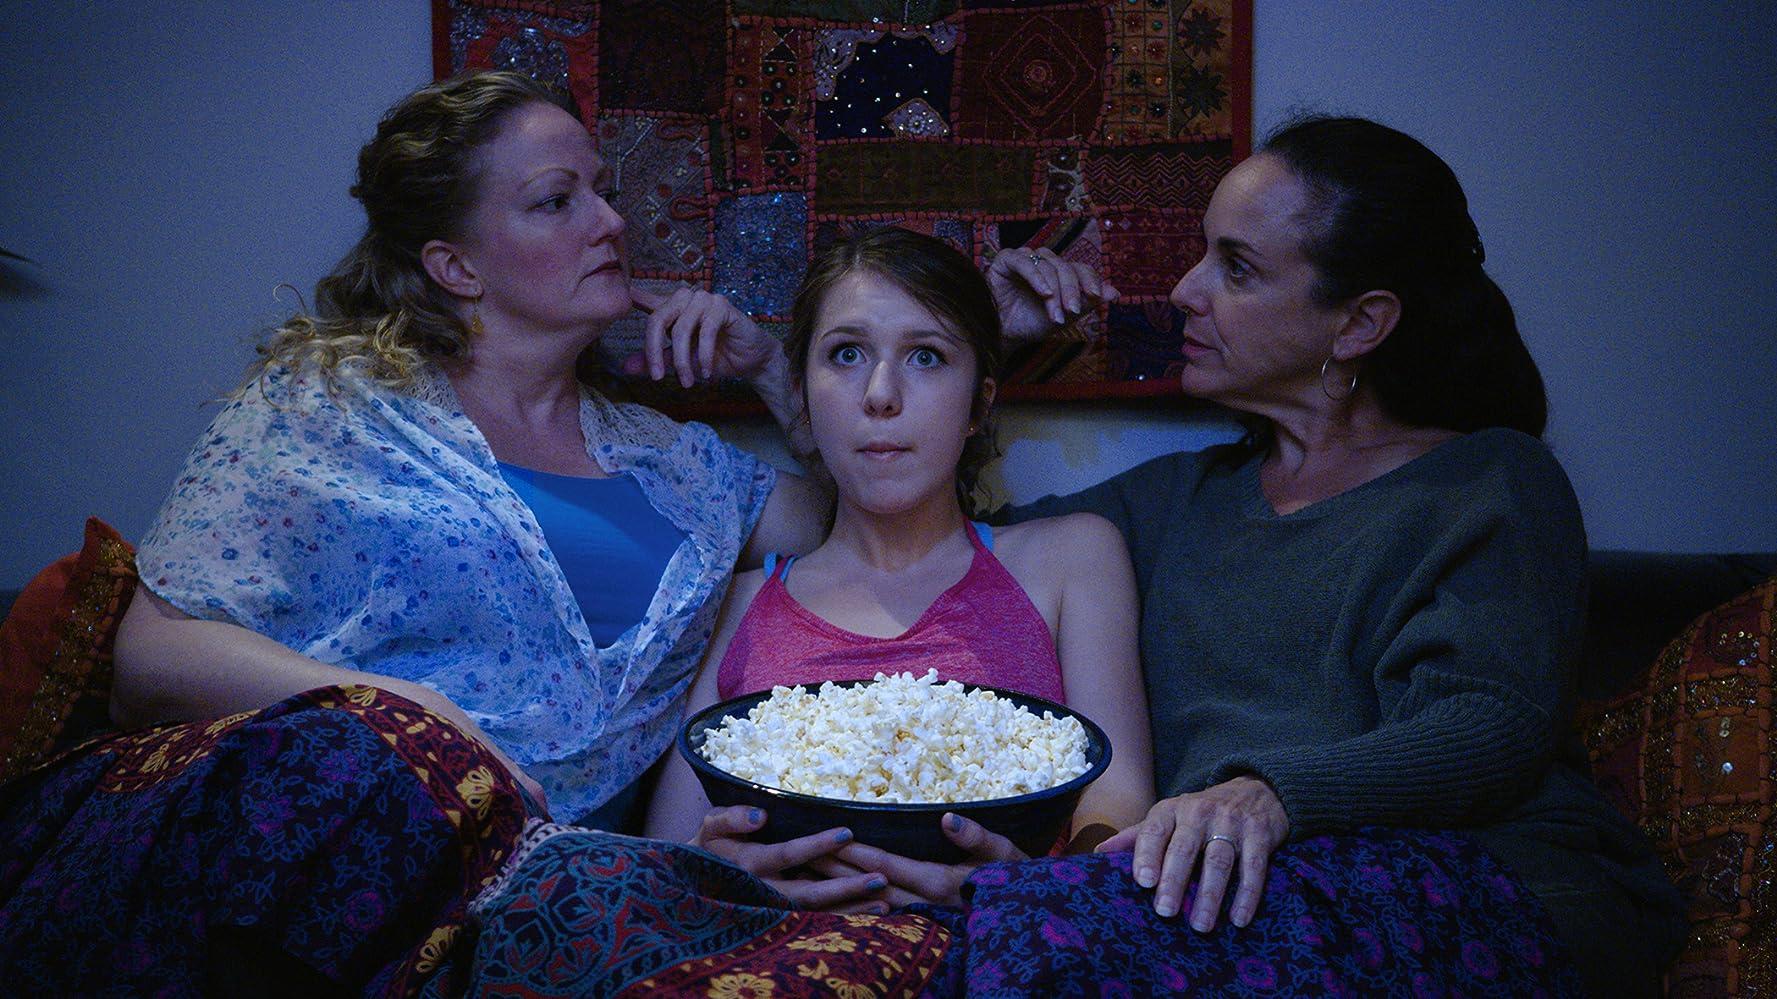 Krystal Davis,Jona Xiao Erotic pics & movies Arielle Holmes,Susan Engel